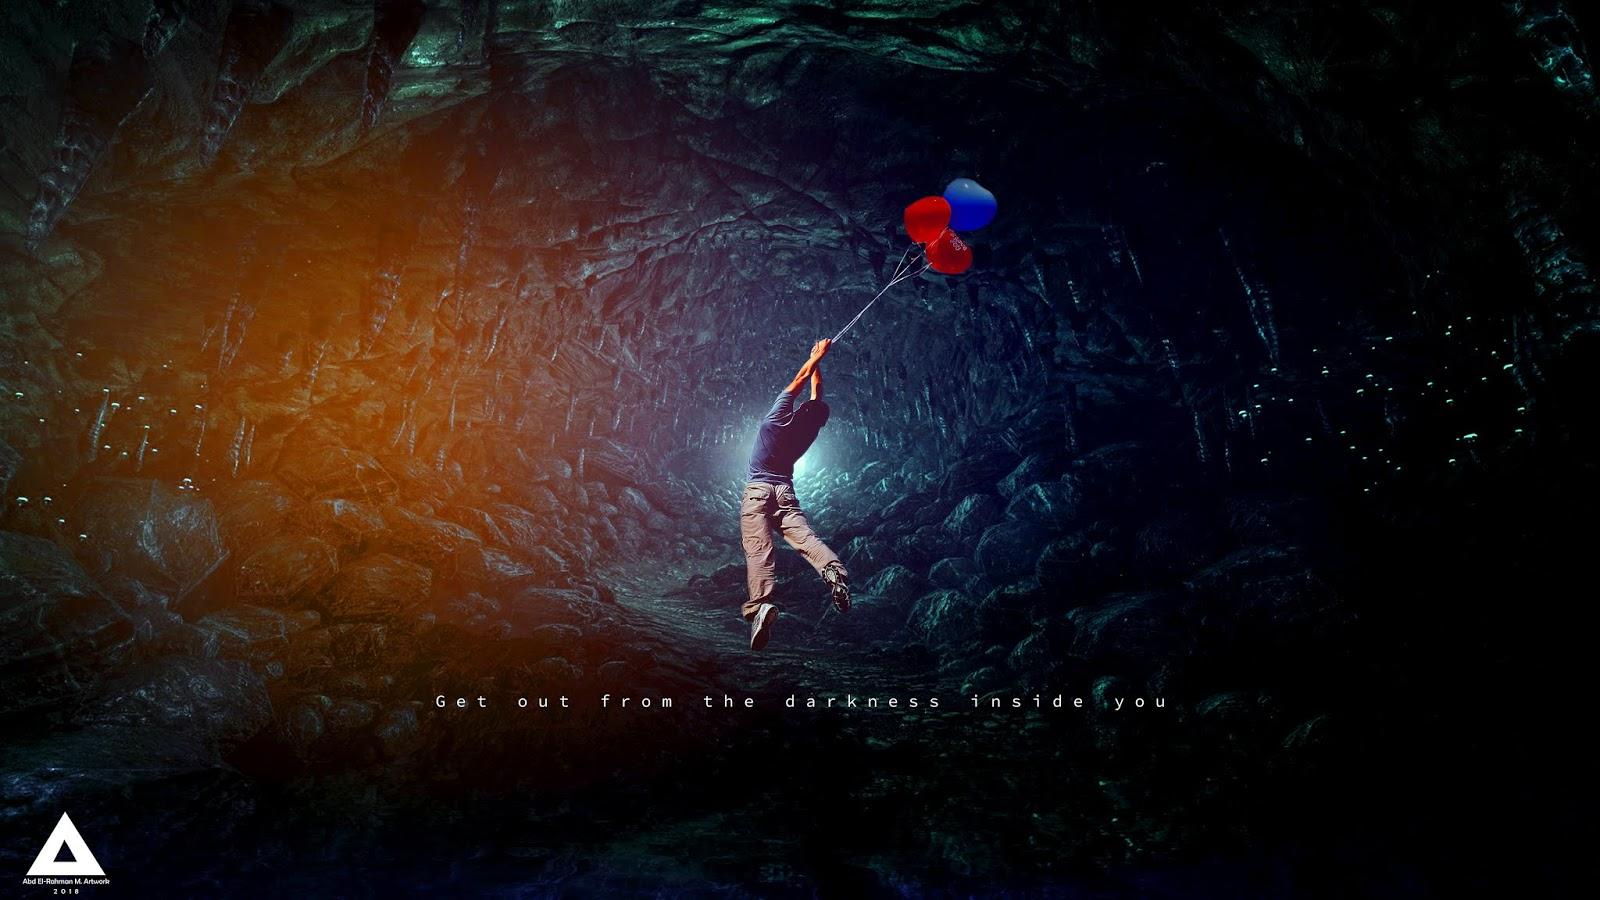 Darkness, Inspirational, Motivation, 4K, Creative Graphics